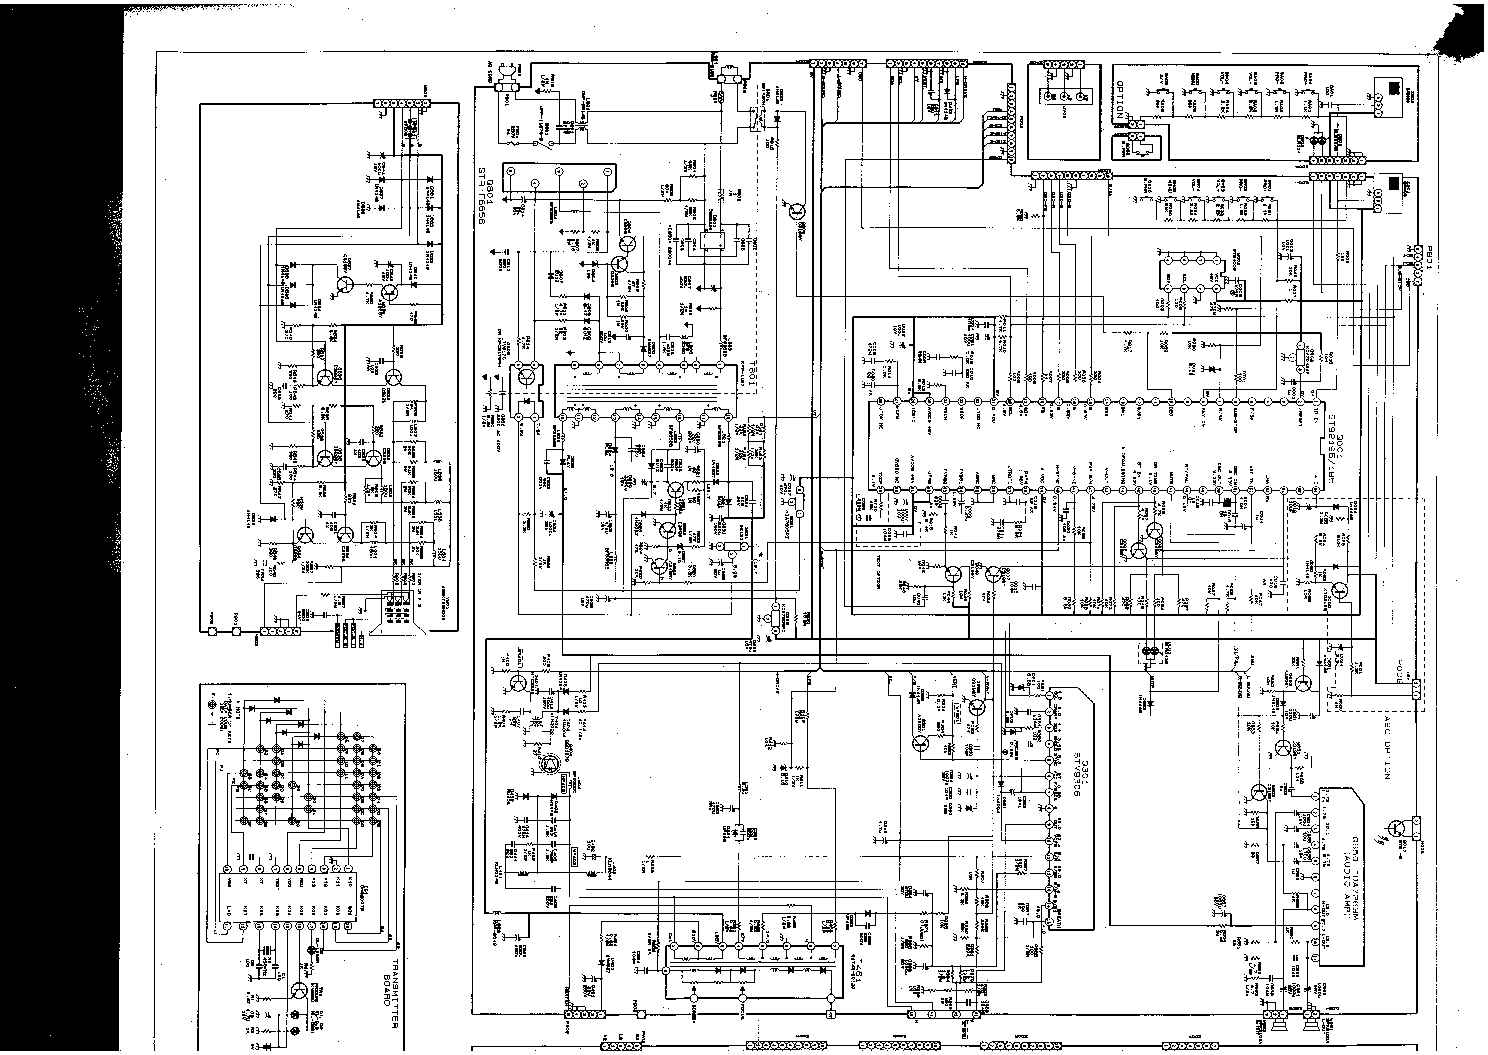 medium resolution of t v circuit diagram free download wiring diagram postt v circuit diagram free download wiring diagram page